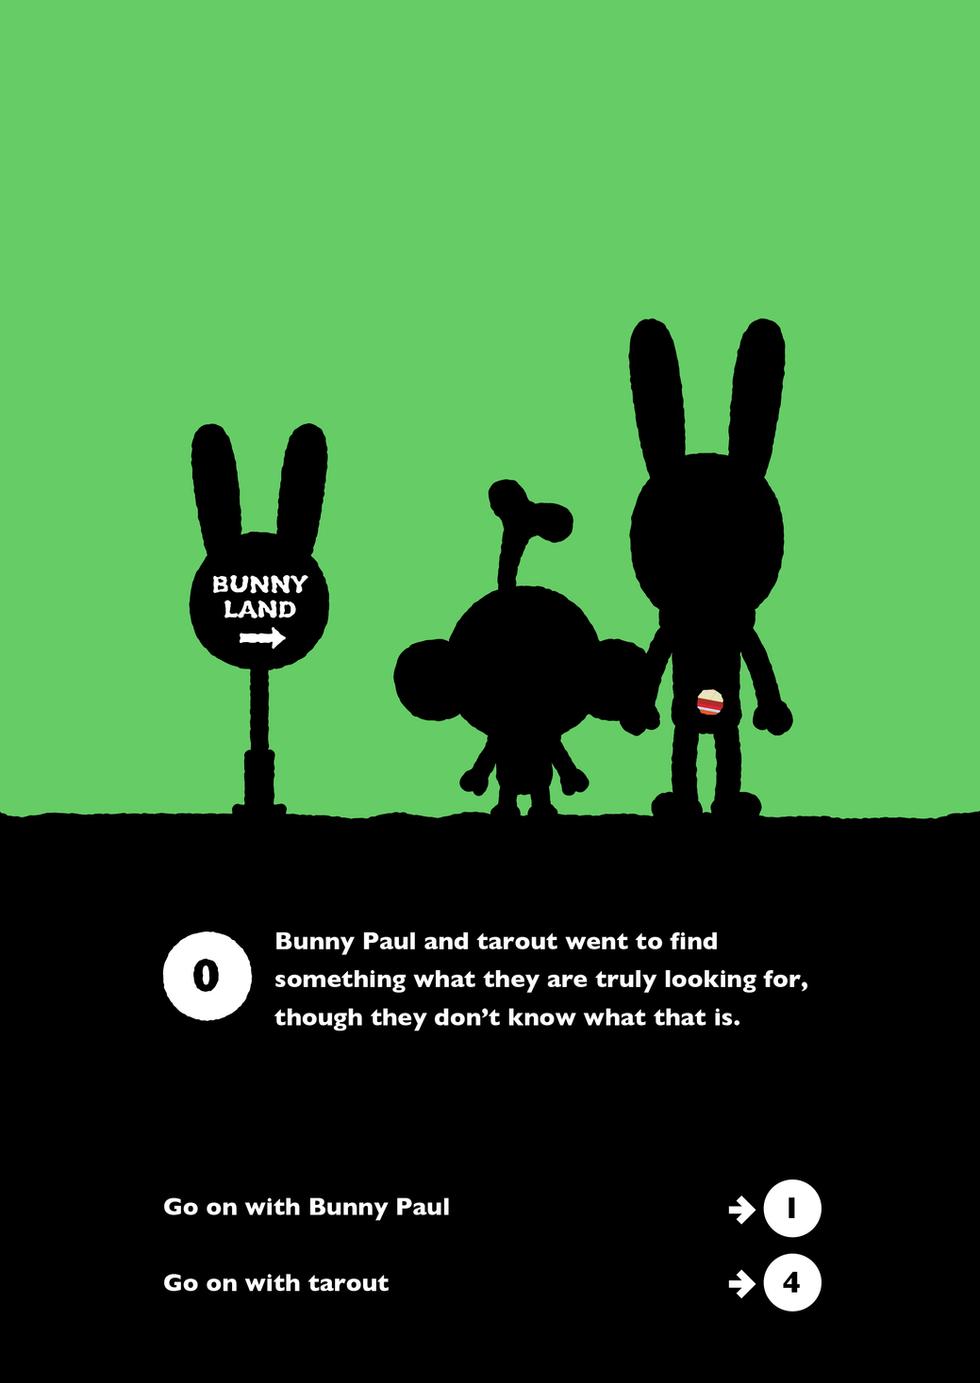 book-bunny-paul-02.png